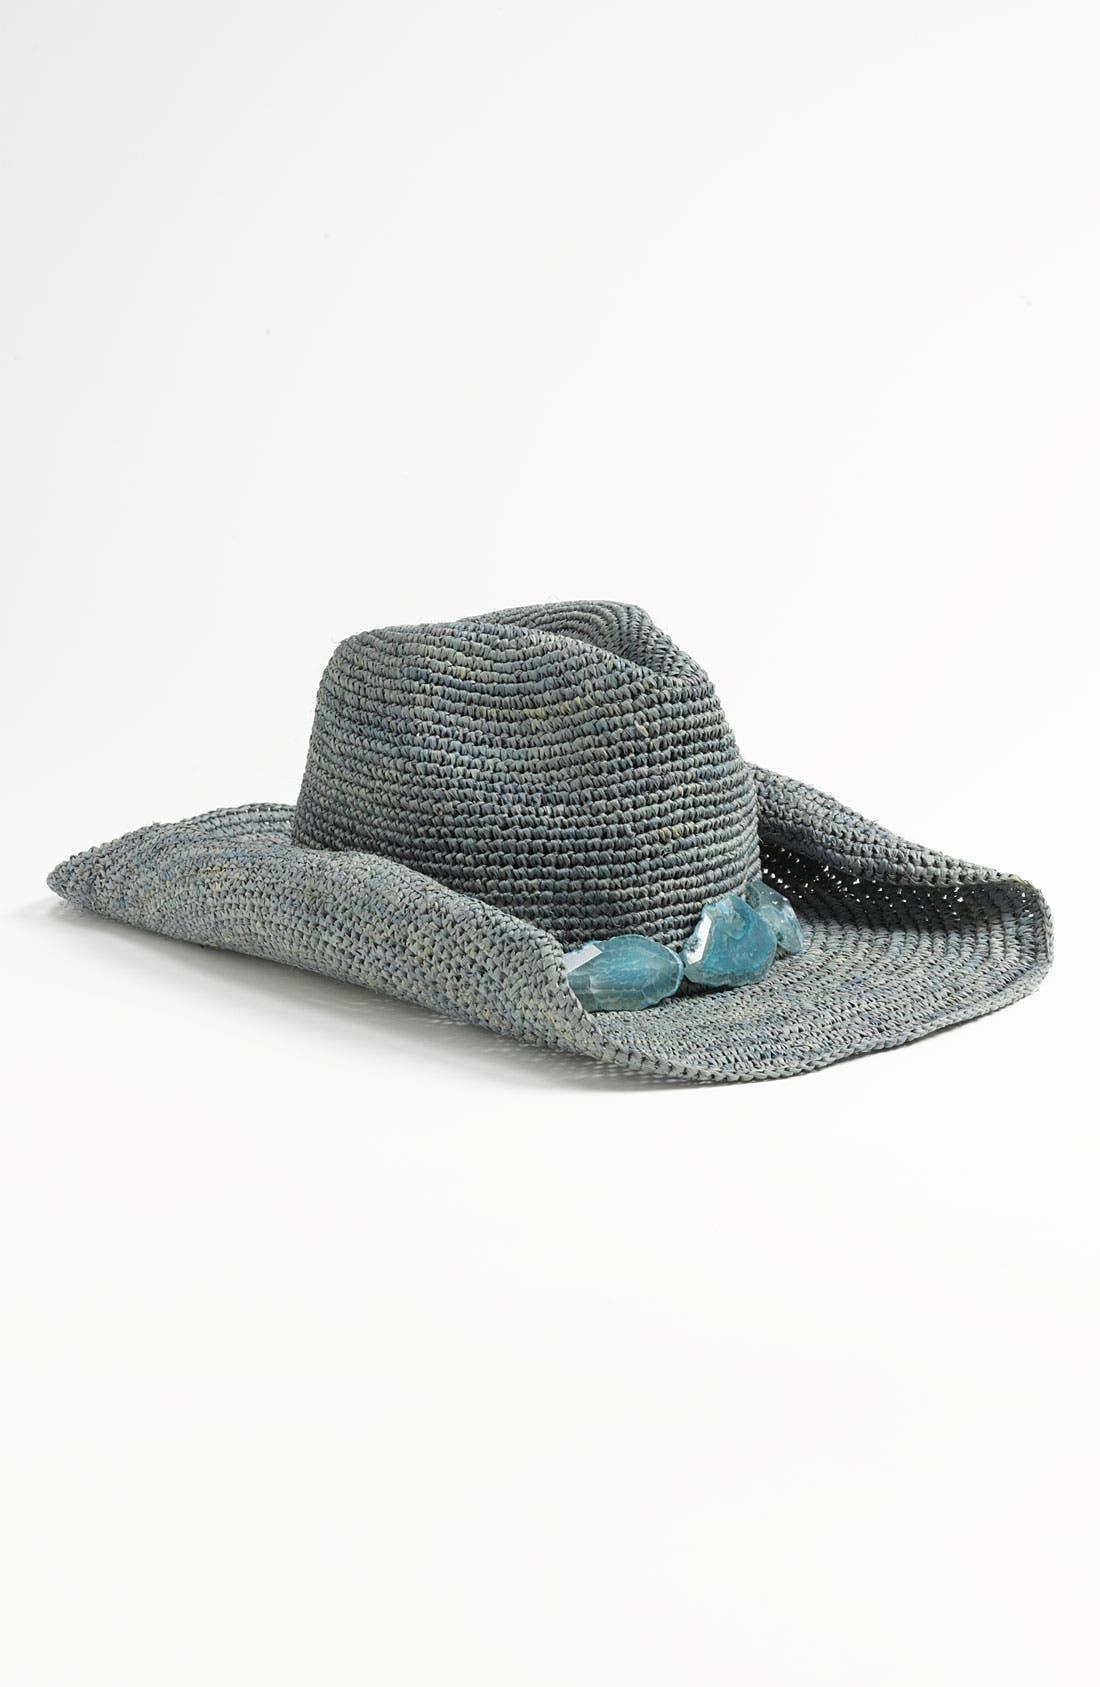 Alternate Image 1 Selected - Flora Bella 'Druzy' Cowboy Hat